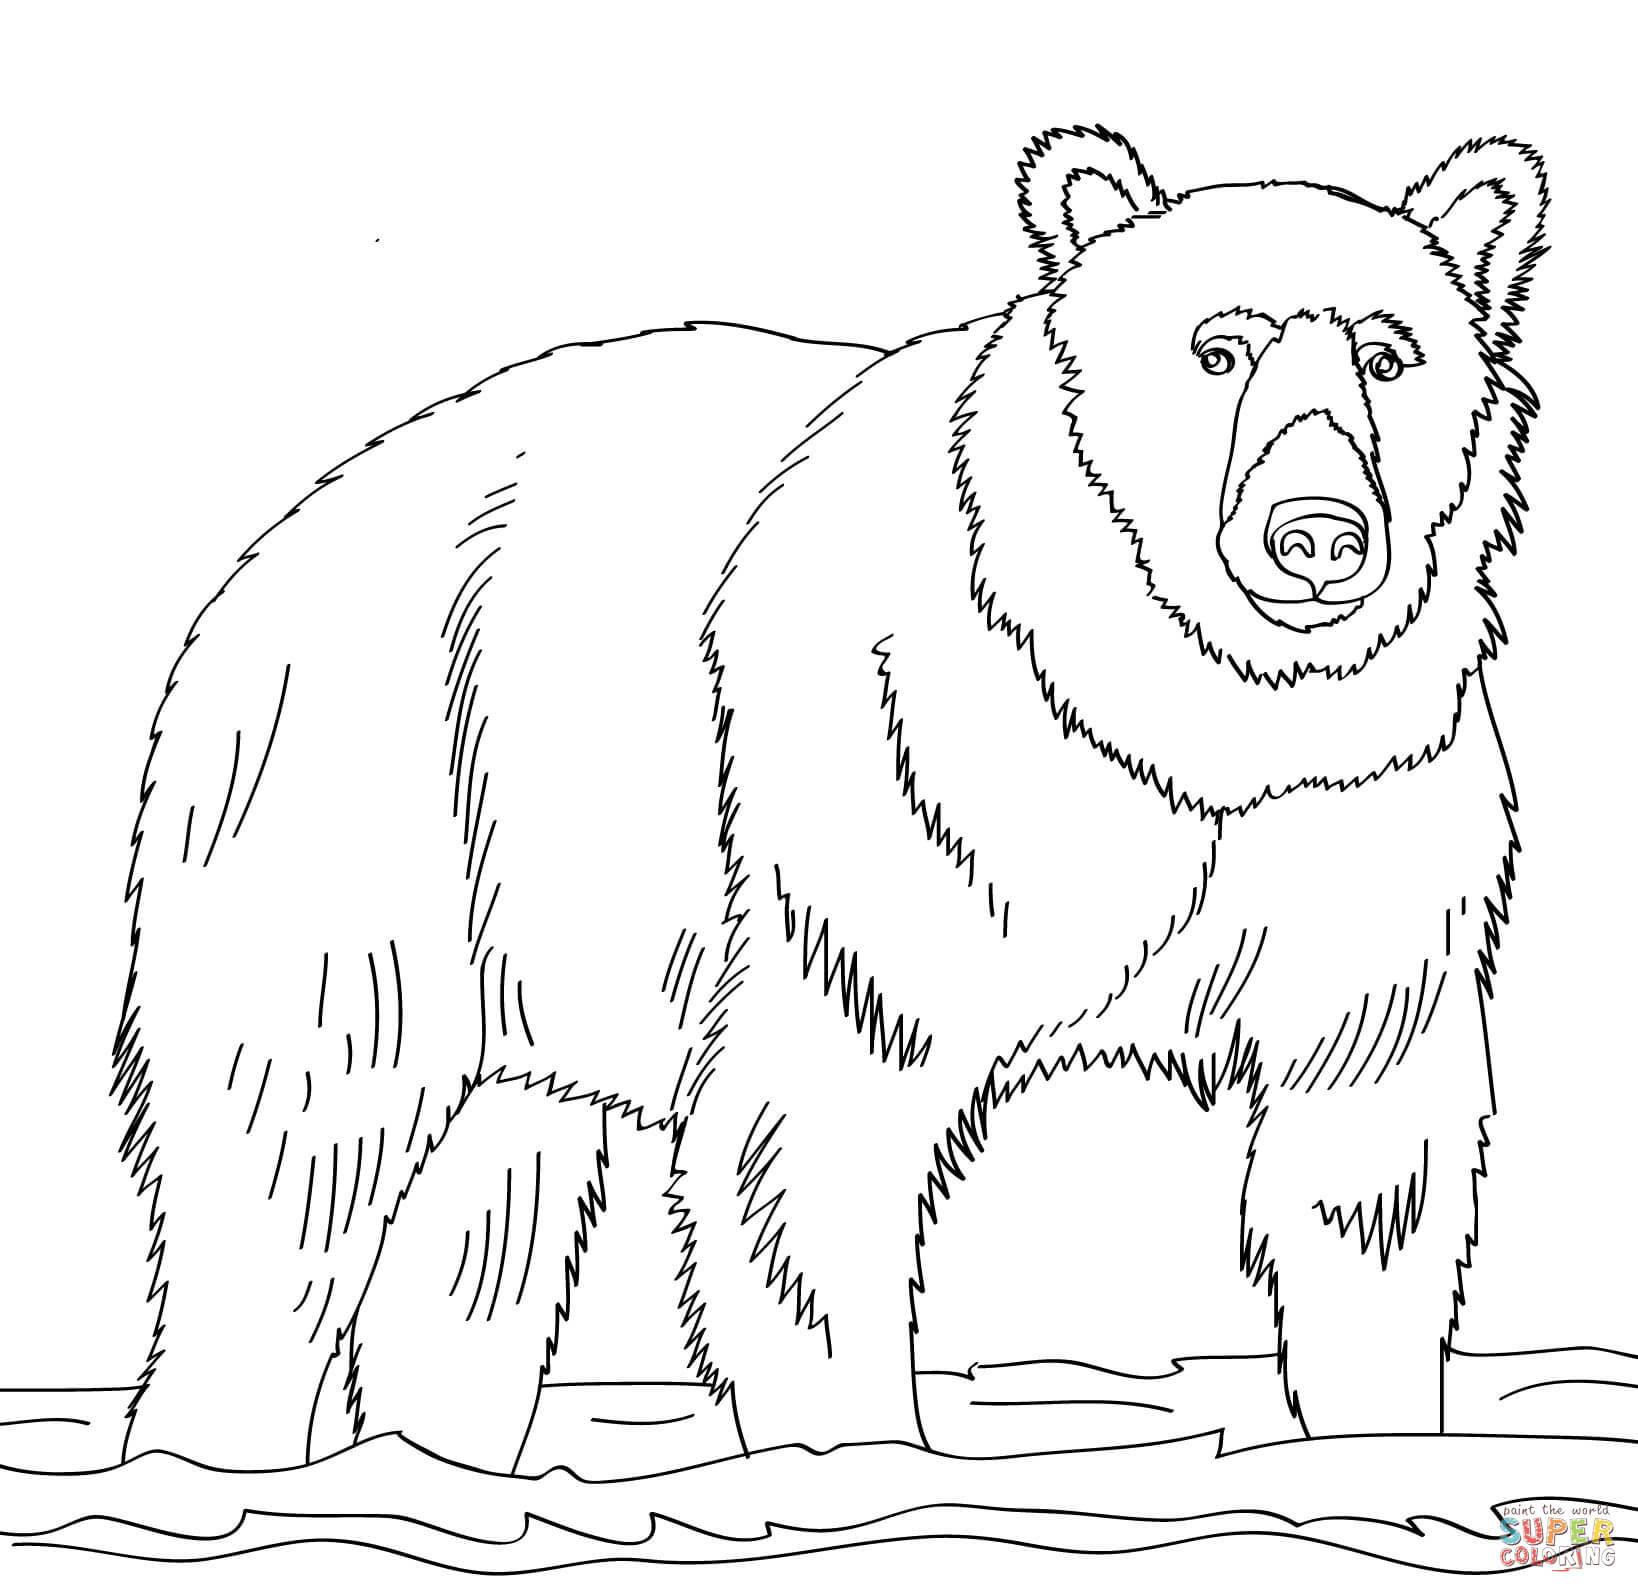 Brown Bear Brown Bear Coloring Pages  Brown Bear Coloring Pages Coloring Pages For Children